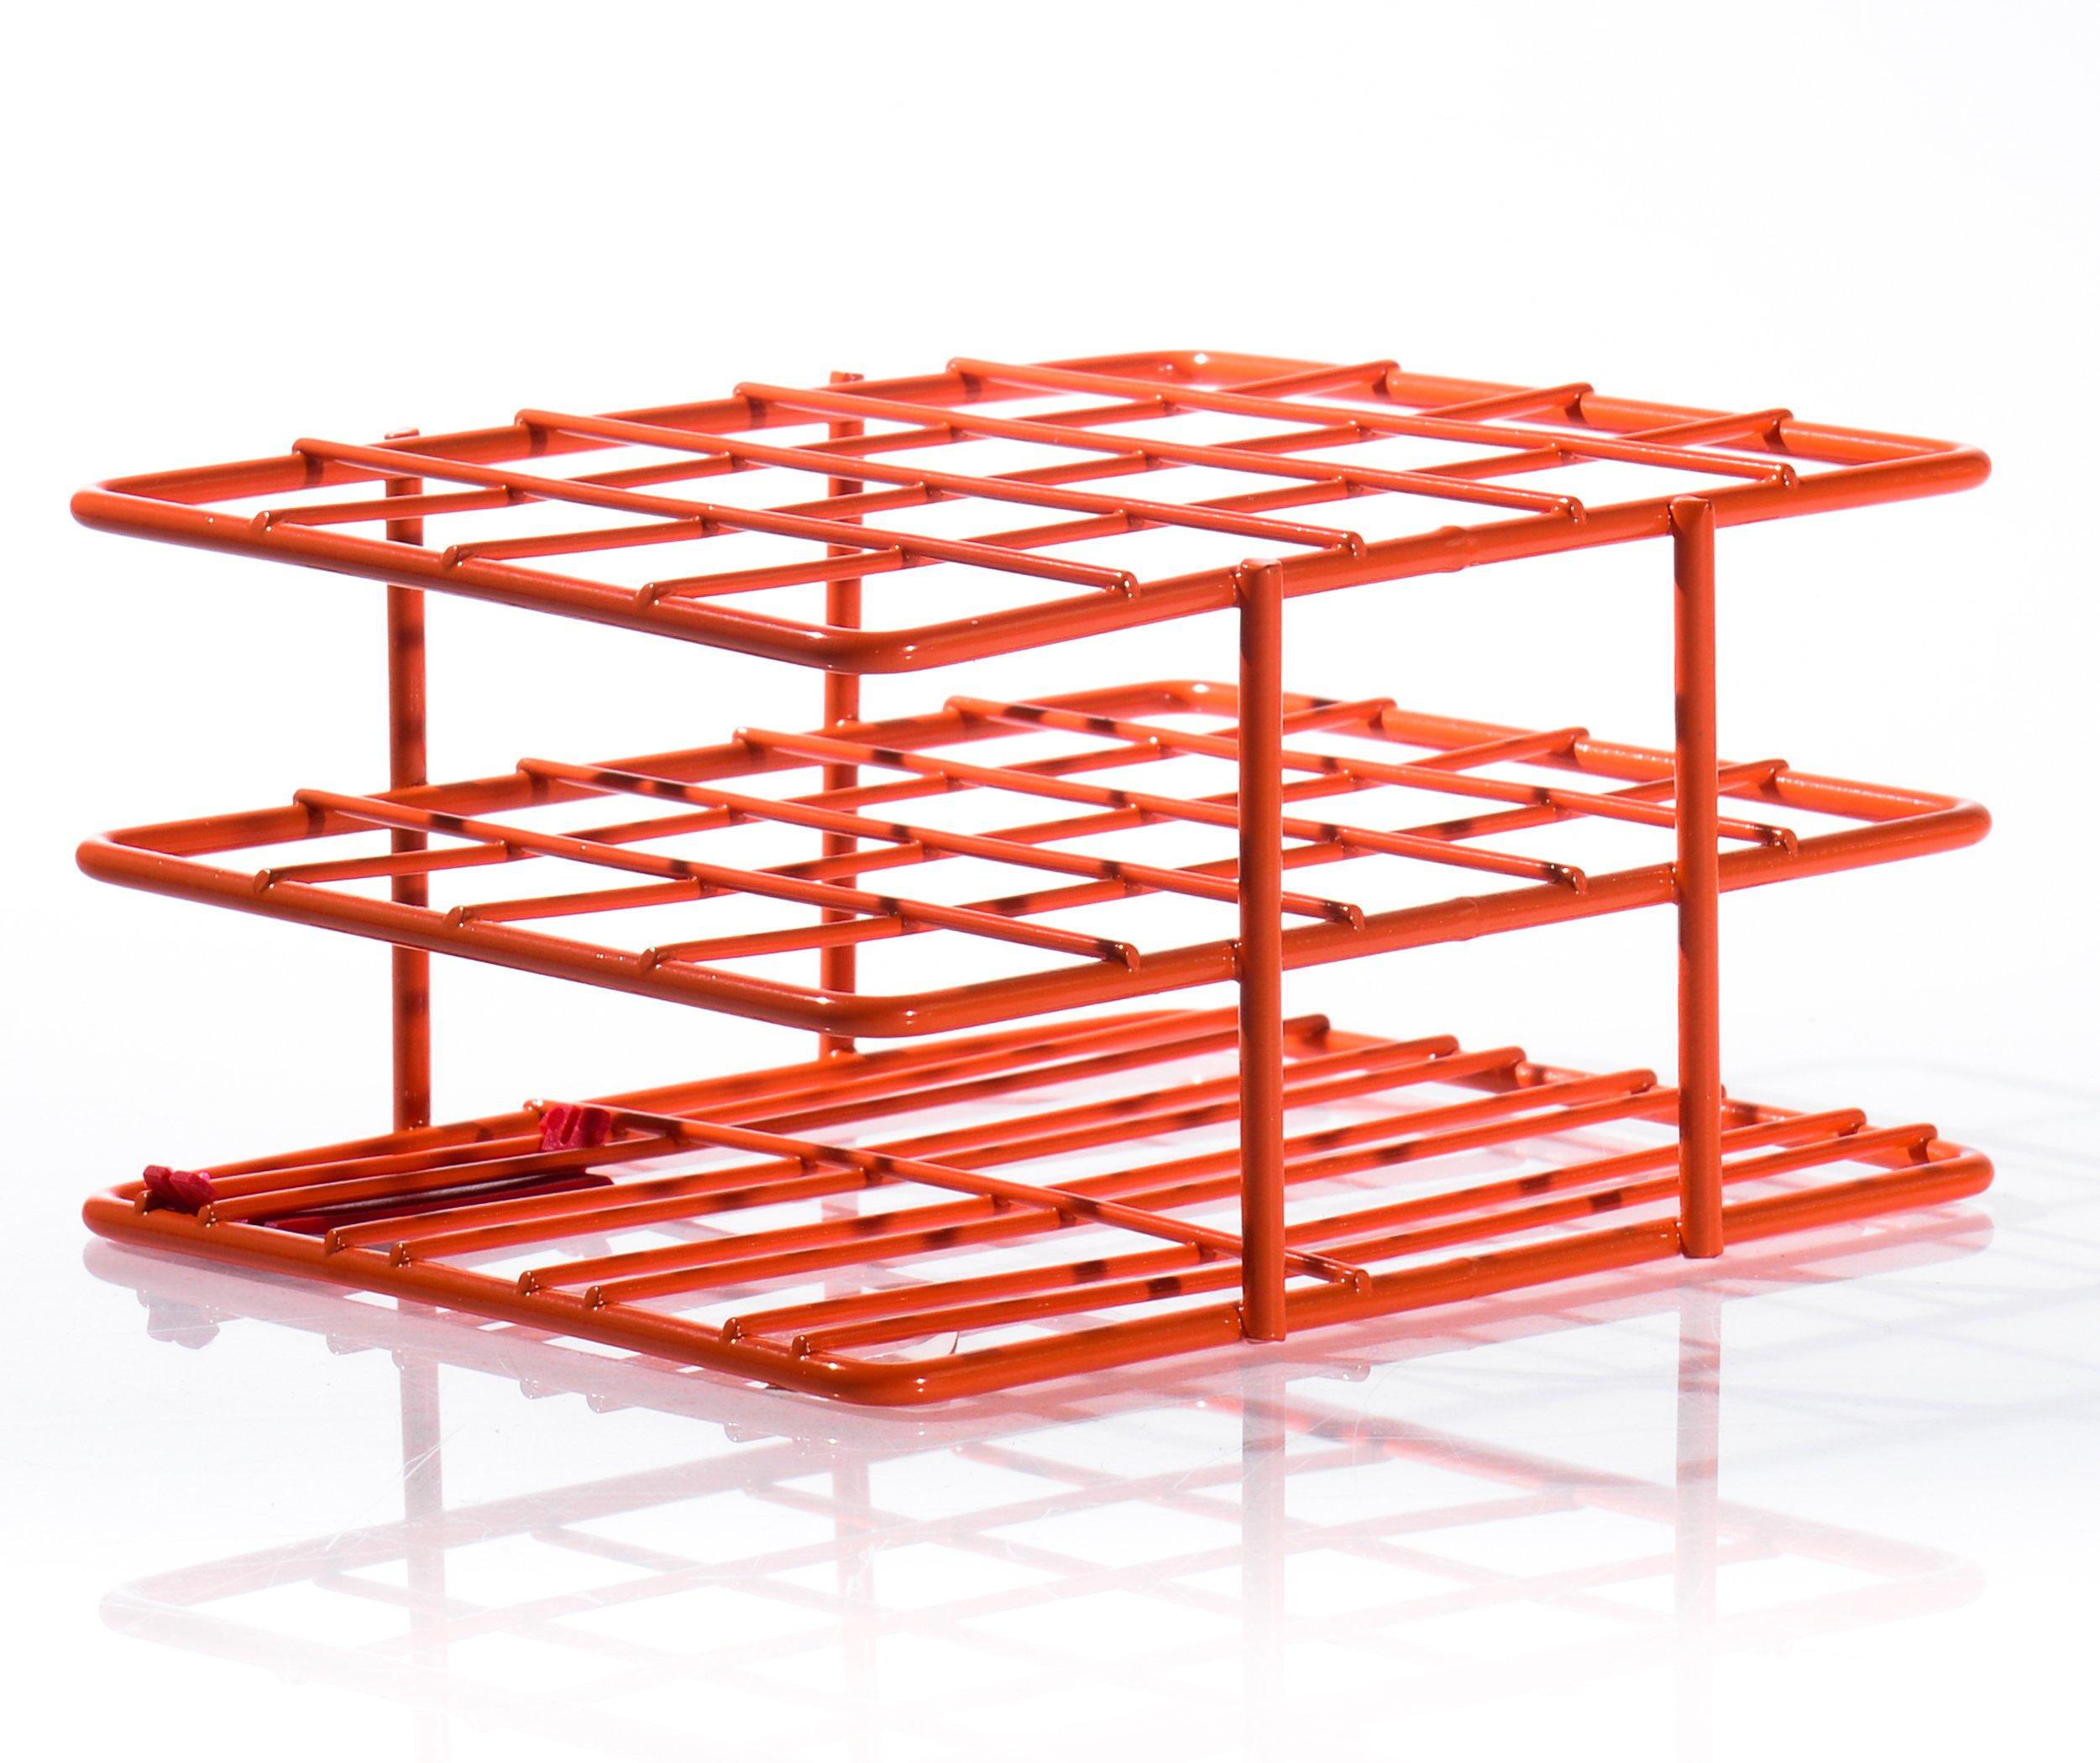 "Bel-Art F18788-2003 Poxygrid ""Half-Size"" Test Tube Rack; 18-20mm, 20 Places, 4¹⁵/₁₆ x 4¹/₄ x 2¹/₂ in., Orange"